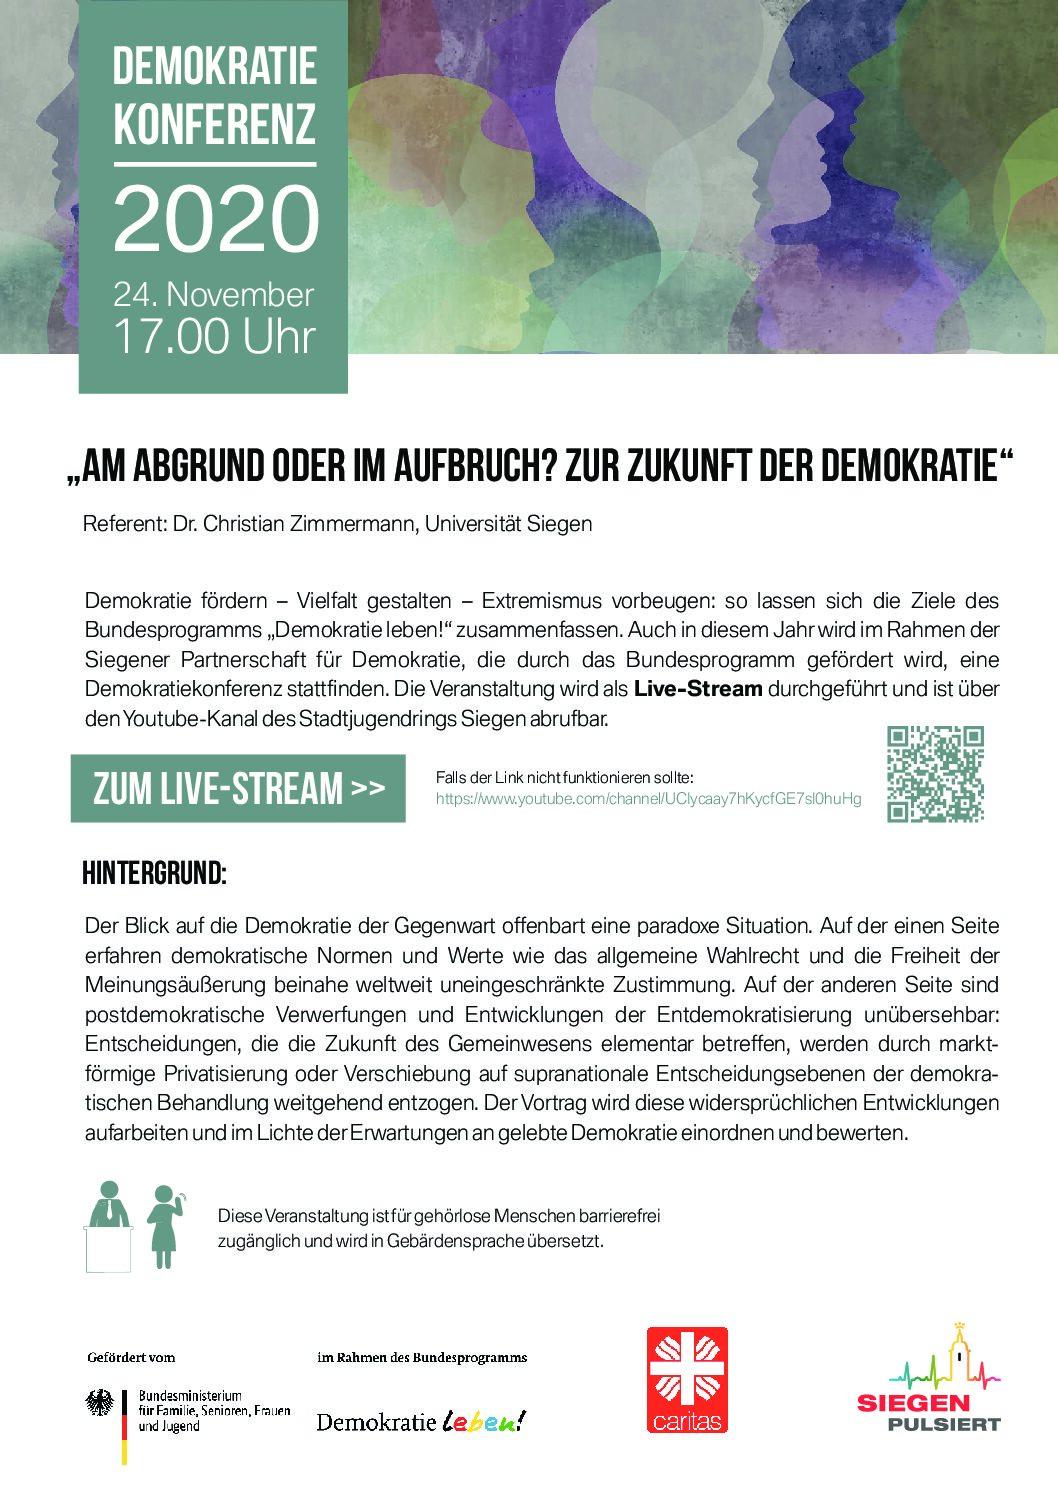 Digitale Demokratiekonferenz am 24. November